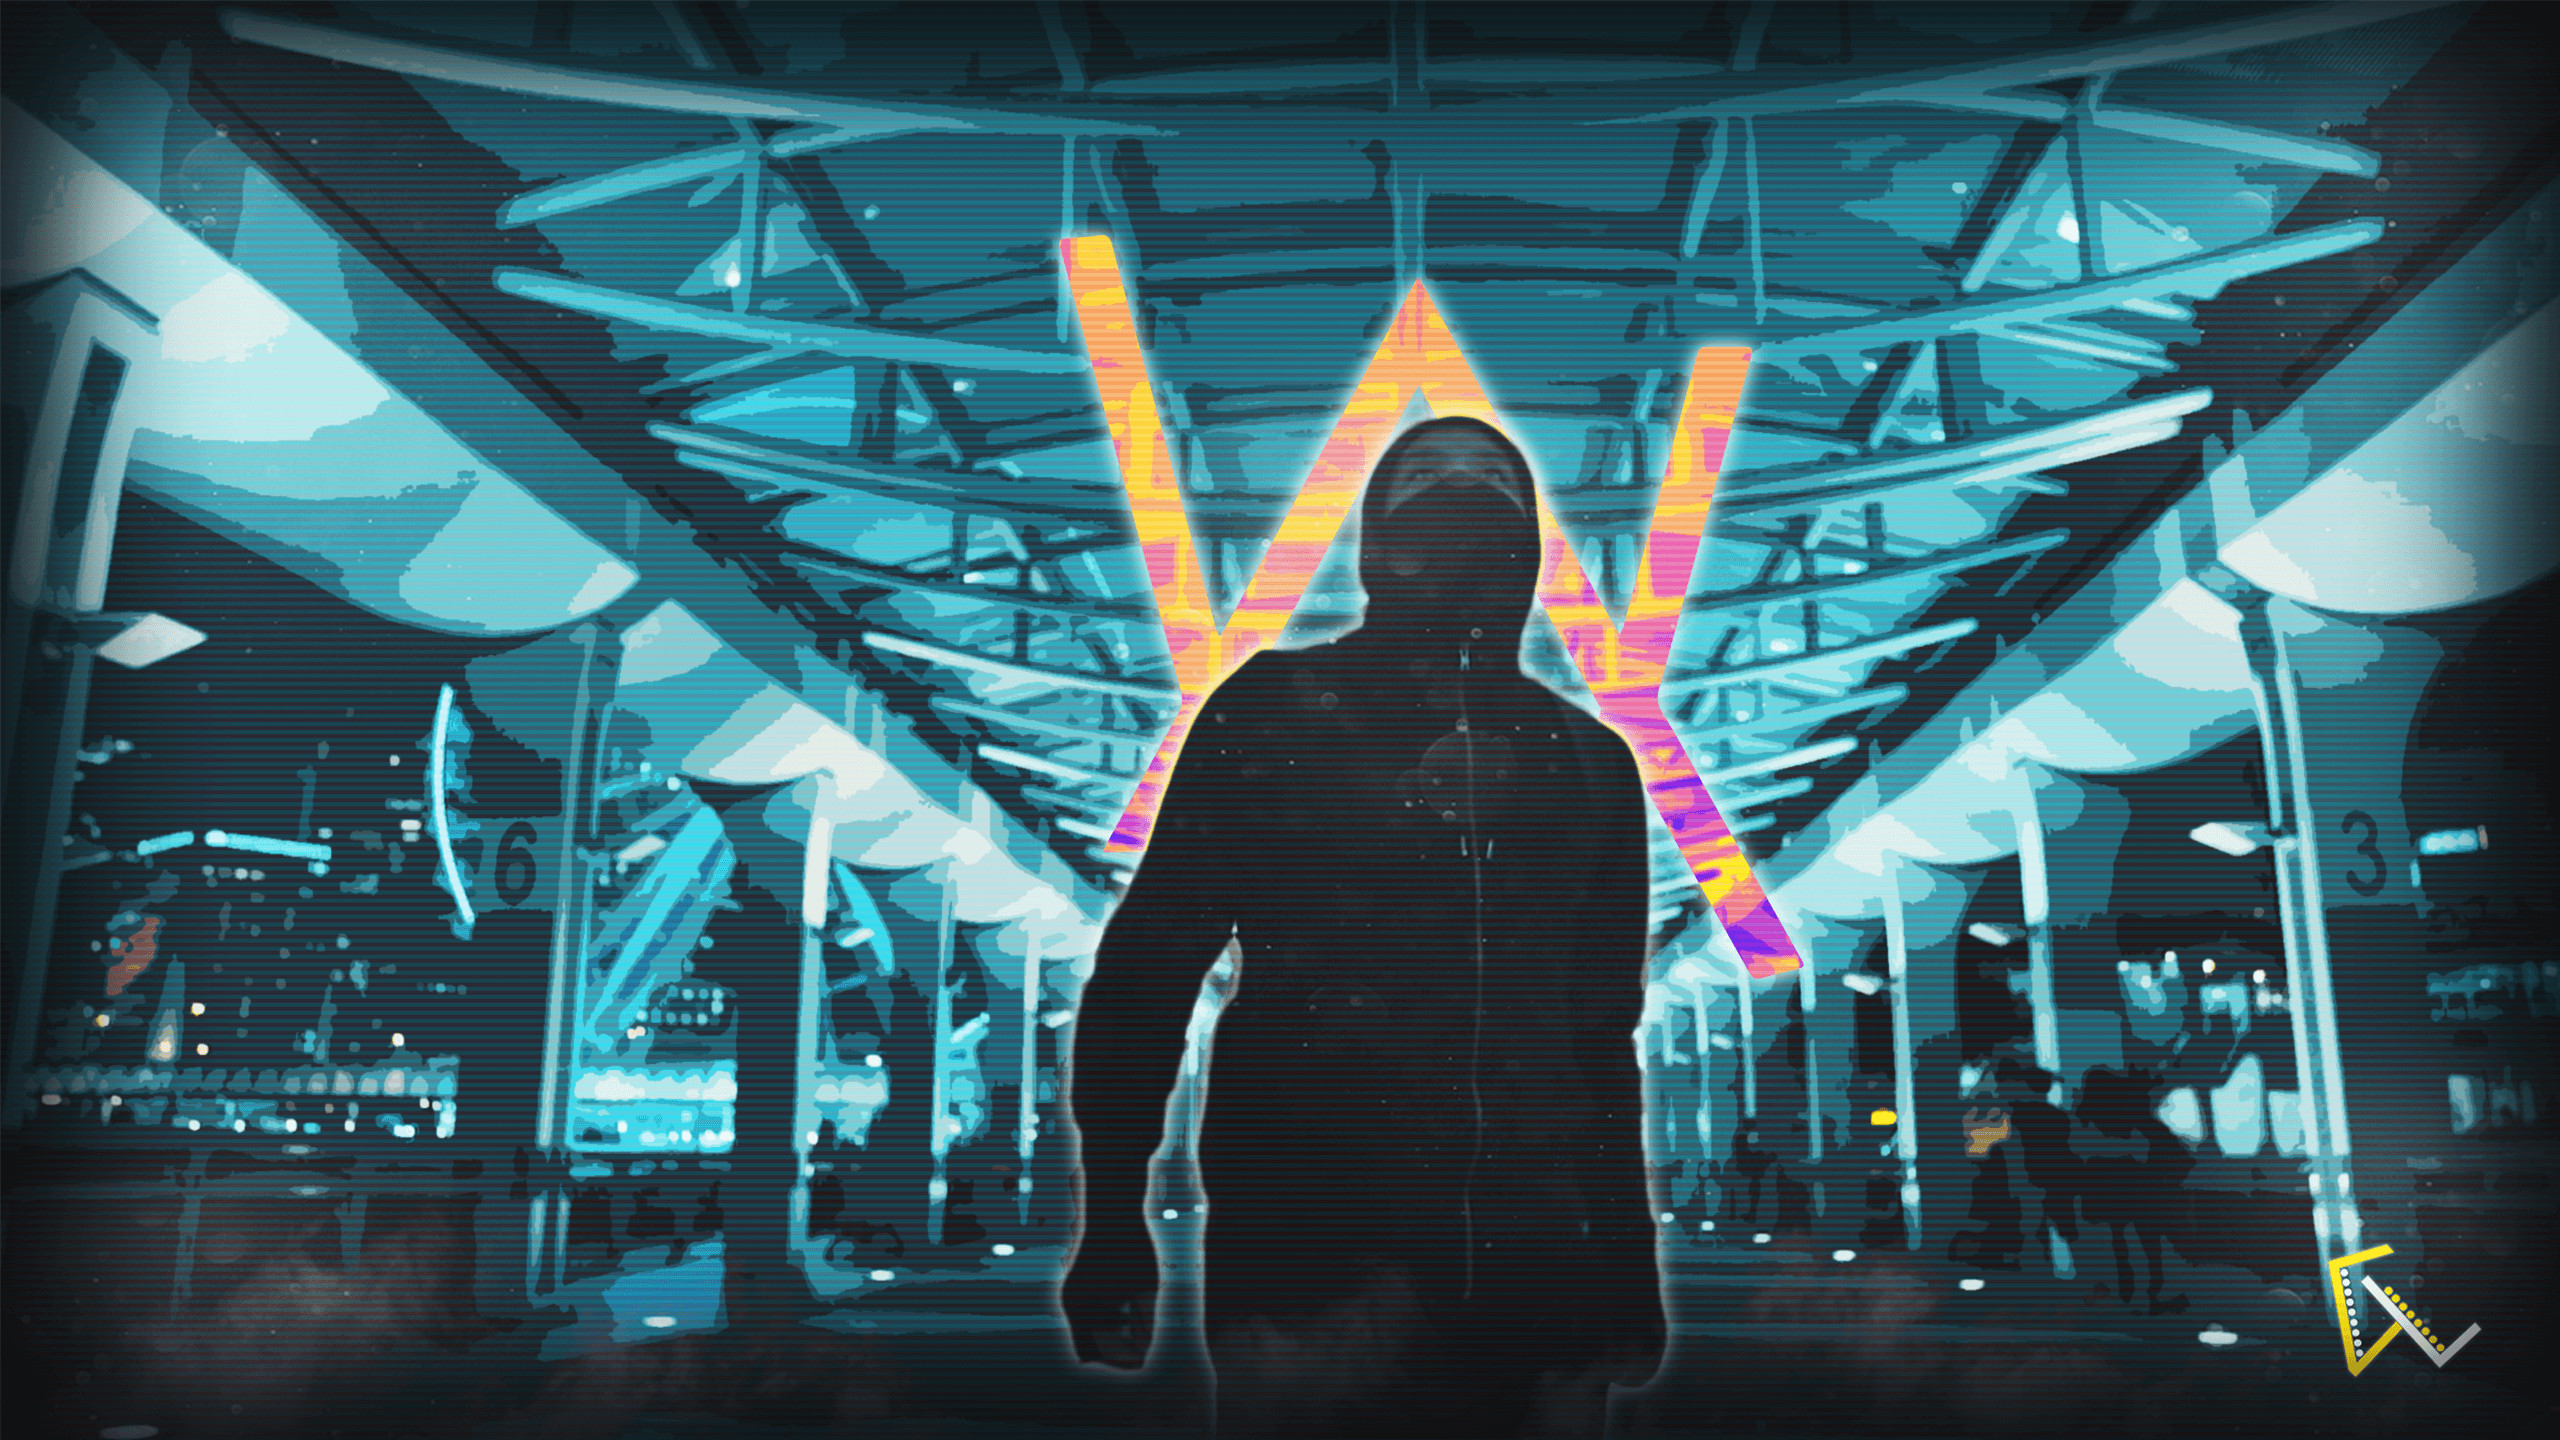 Alan Walker Wallpapers HD Backgrounds   Zoniwallpapers